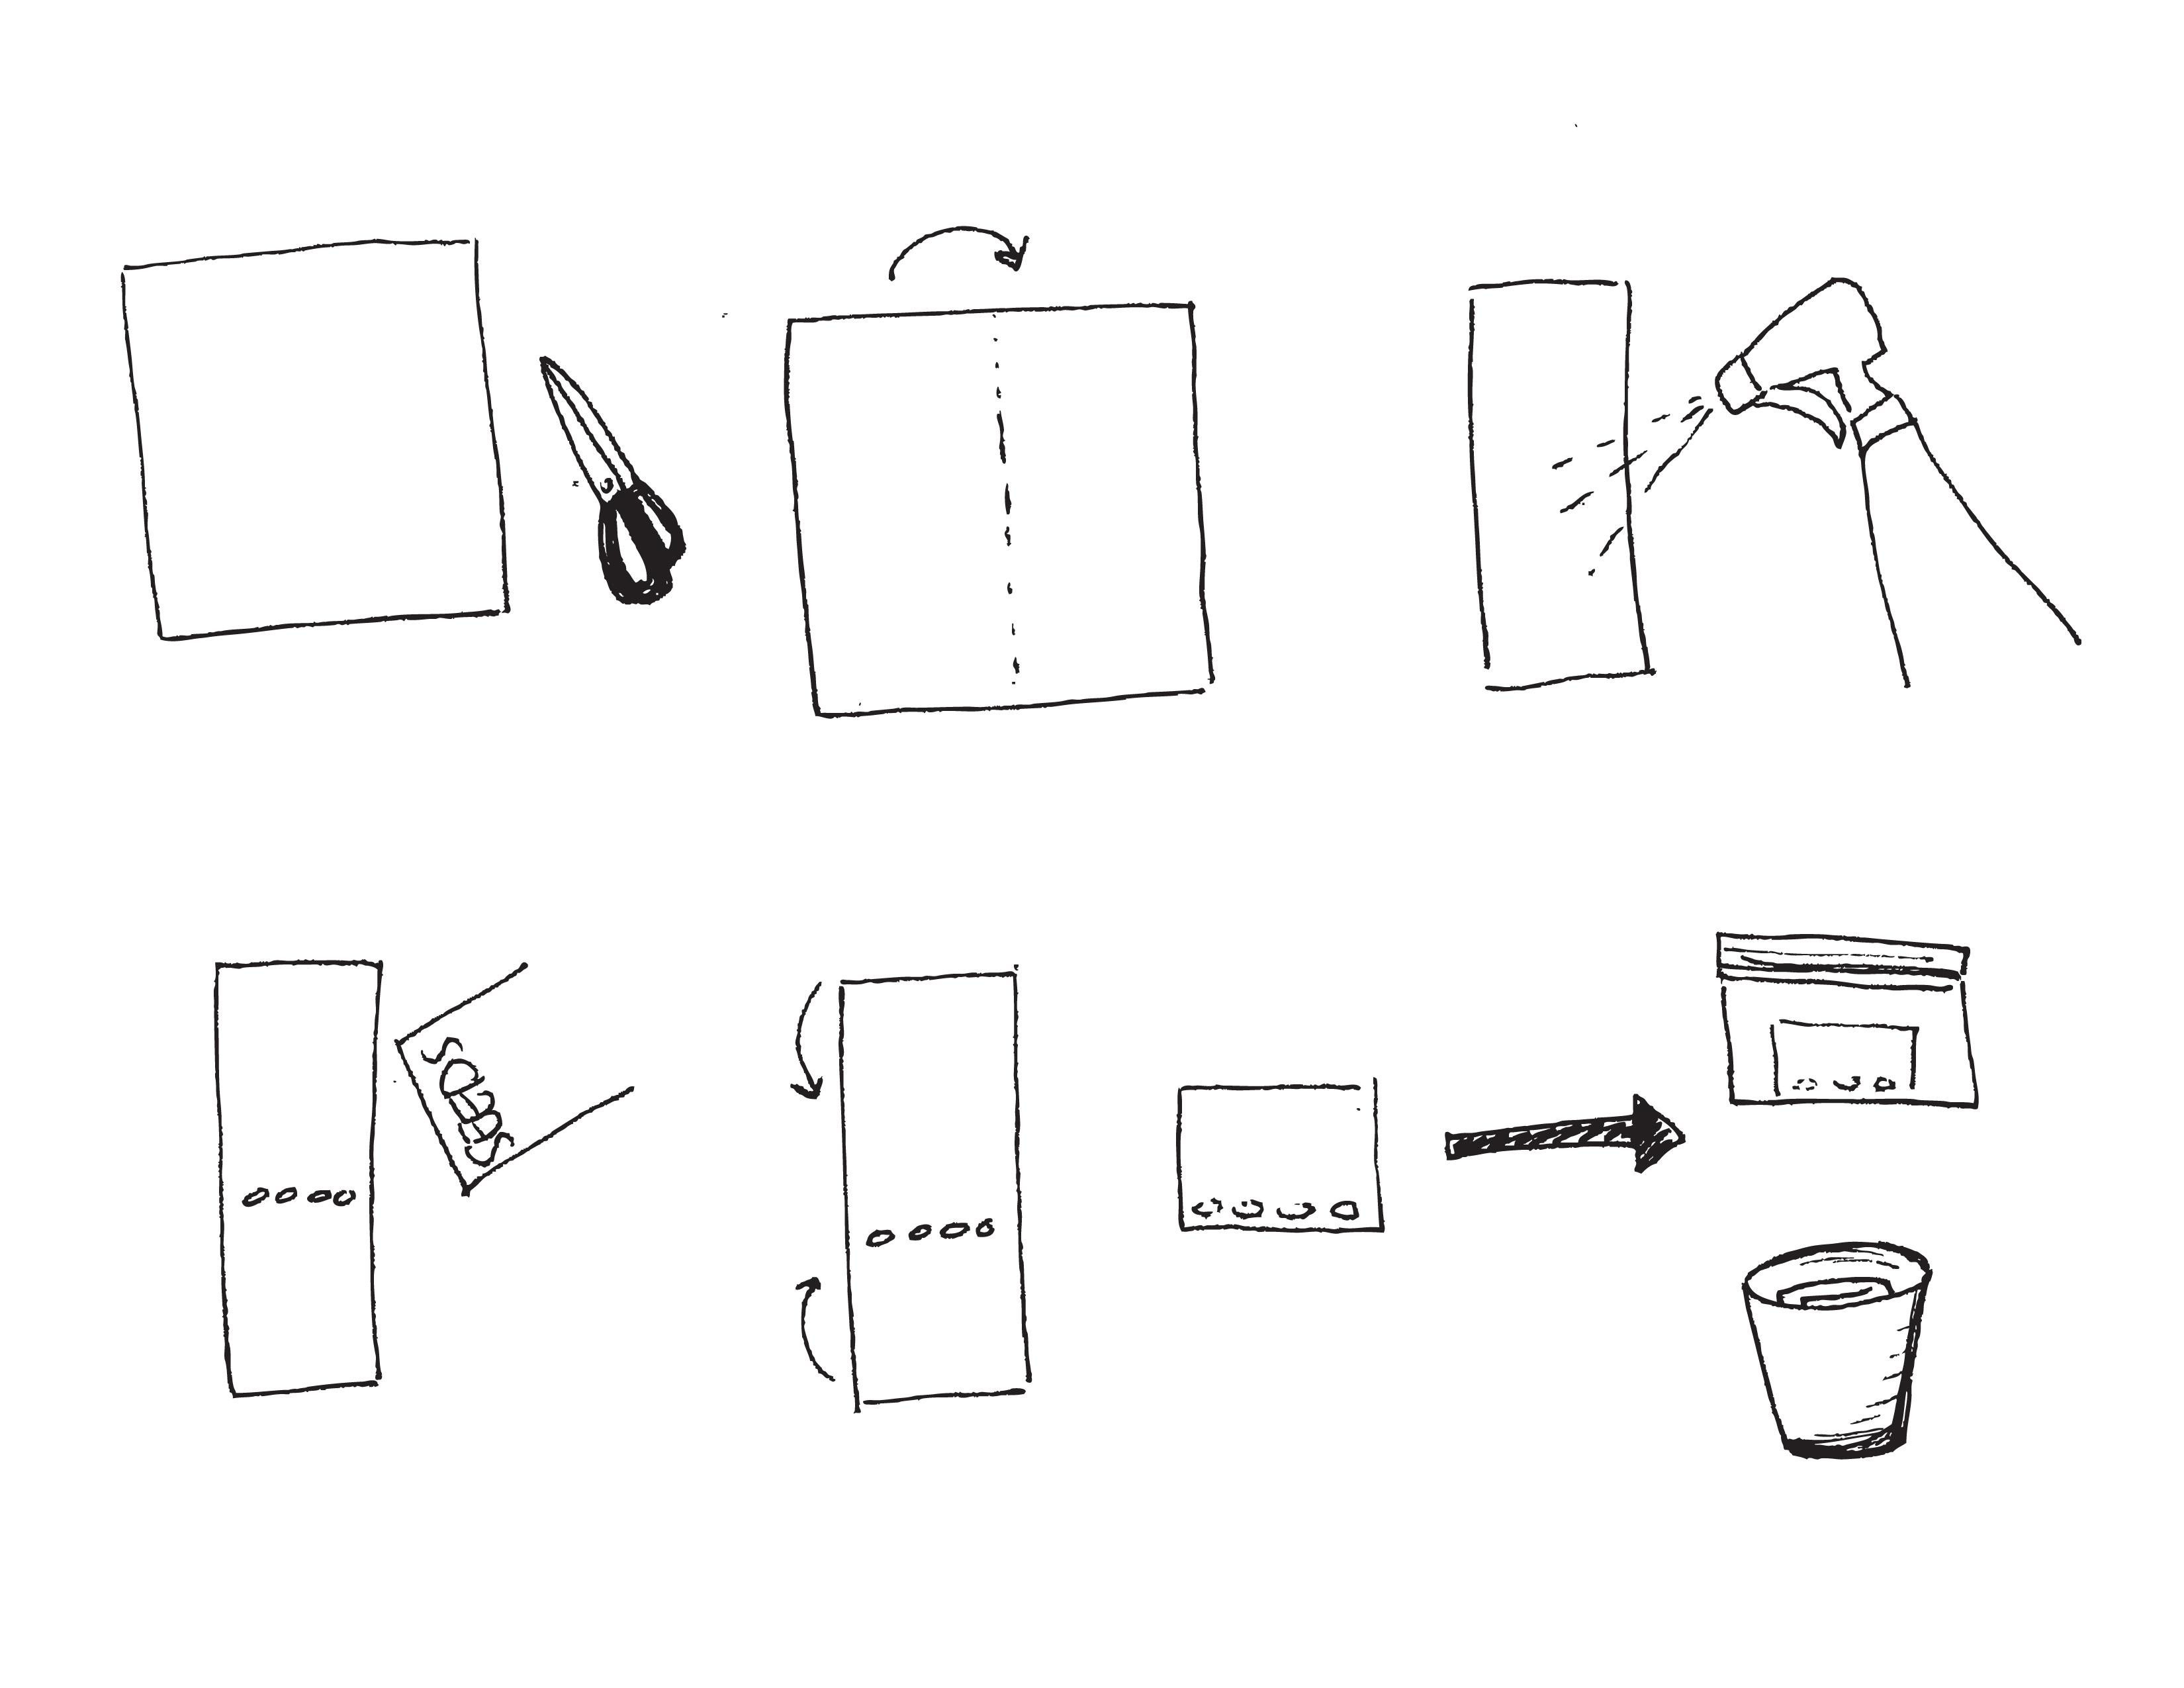 diagram of plastic bags